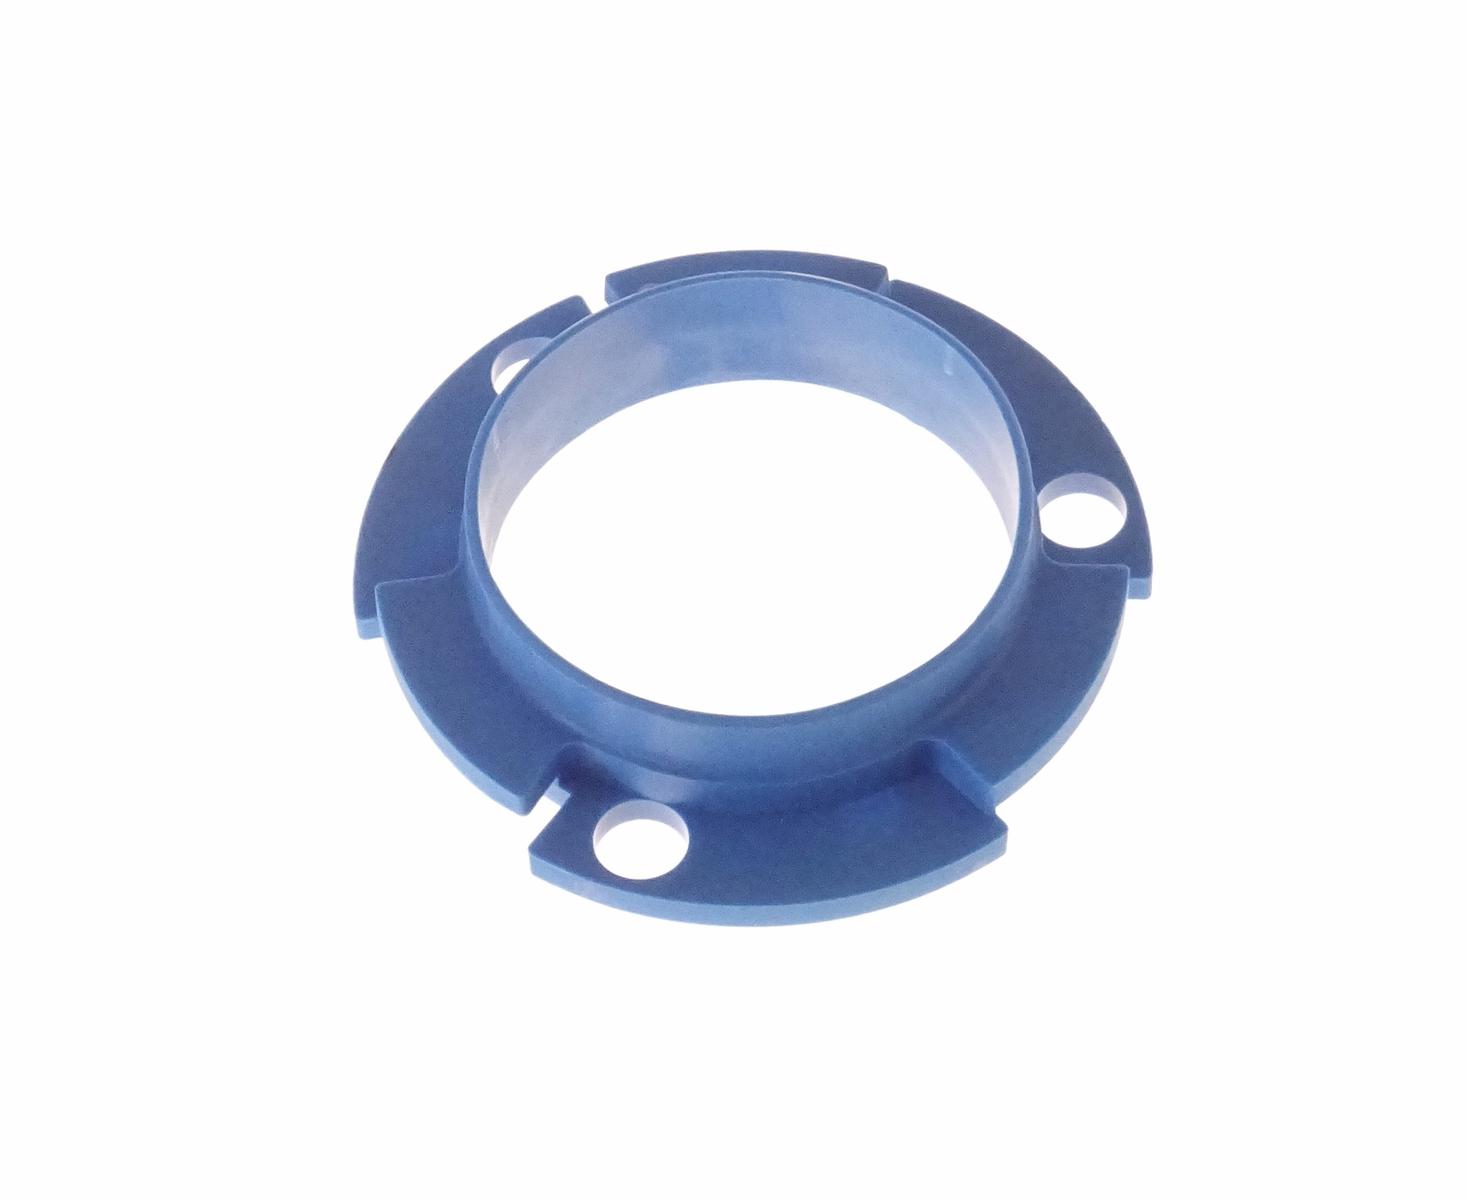 Aretace vstřikovacího čerpadla FORD 2.0 - 3.2 DI, TDCI, TDDI diesel - QUATROS QS10940